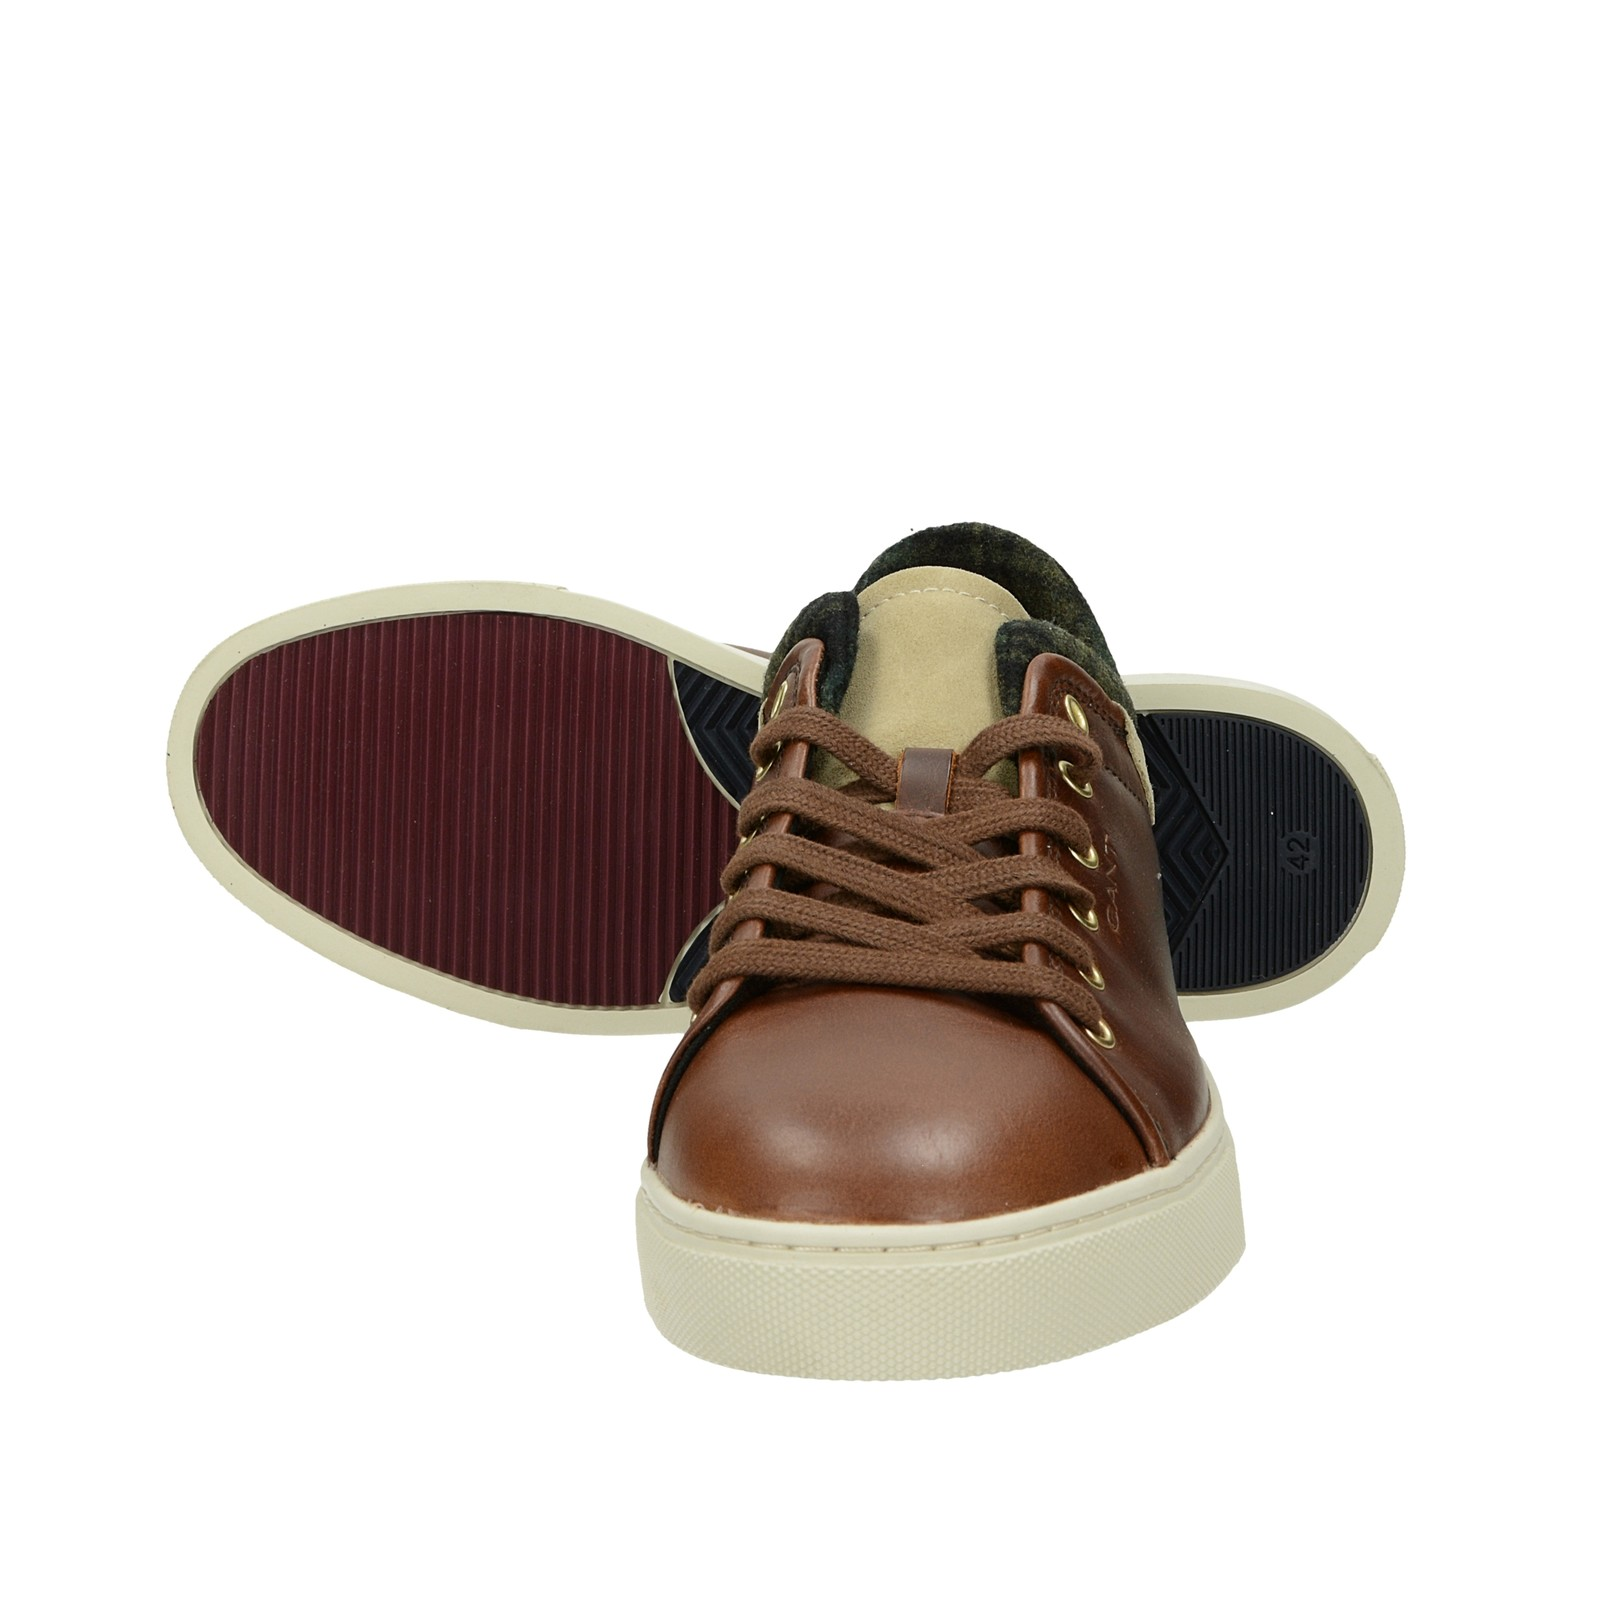 Gant pánske štýlové tenisky - hnedé